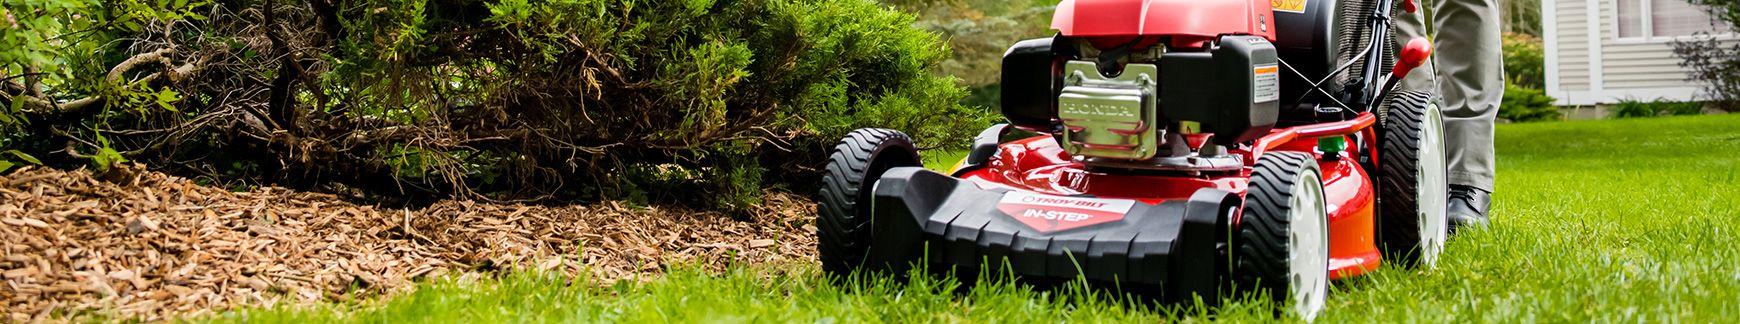 Troy-Bilt Outdoor Power Equipment | Canadian Tire